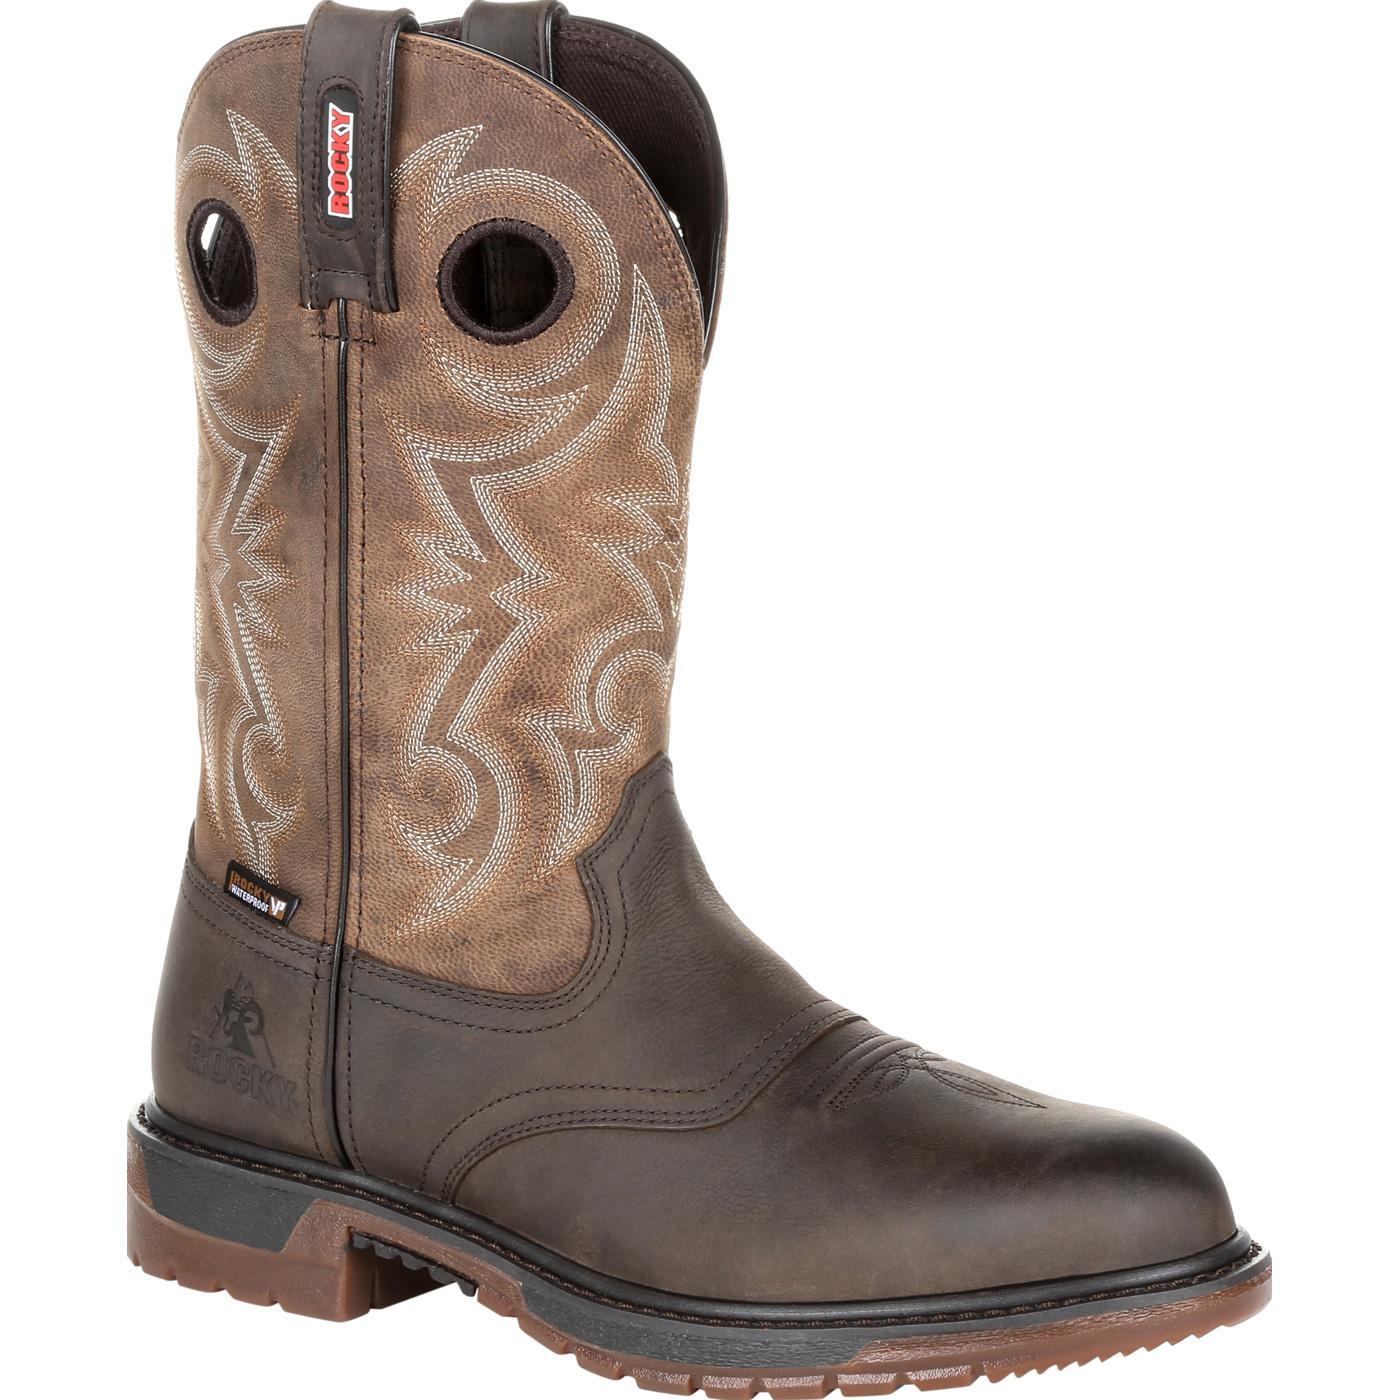 703a54f372e Rocky Original Ride FLX Waterproof Western Boot